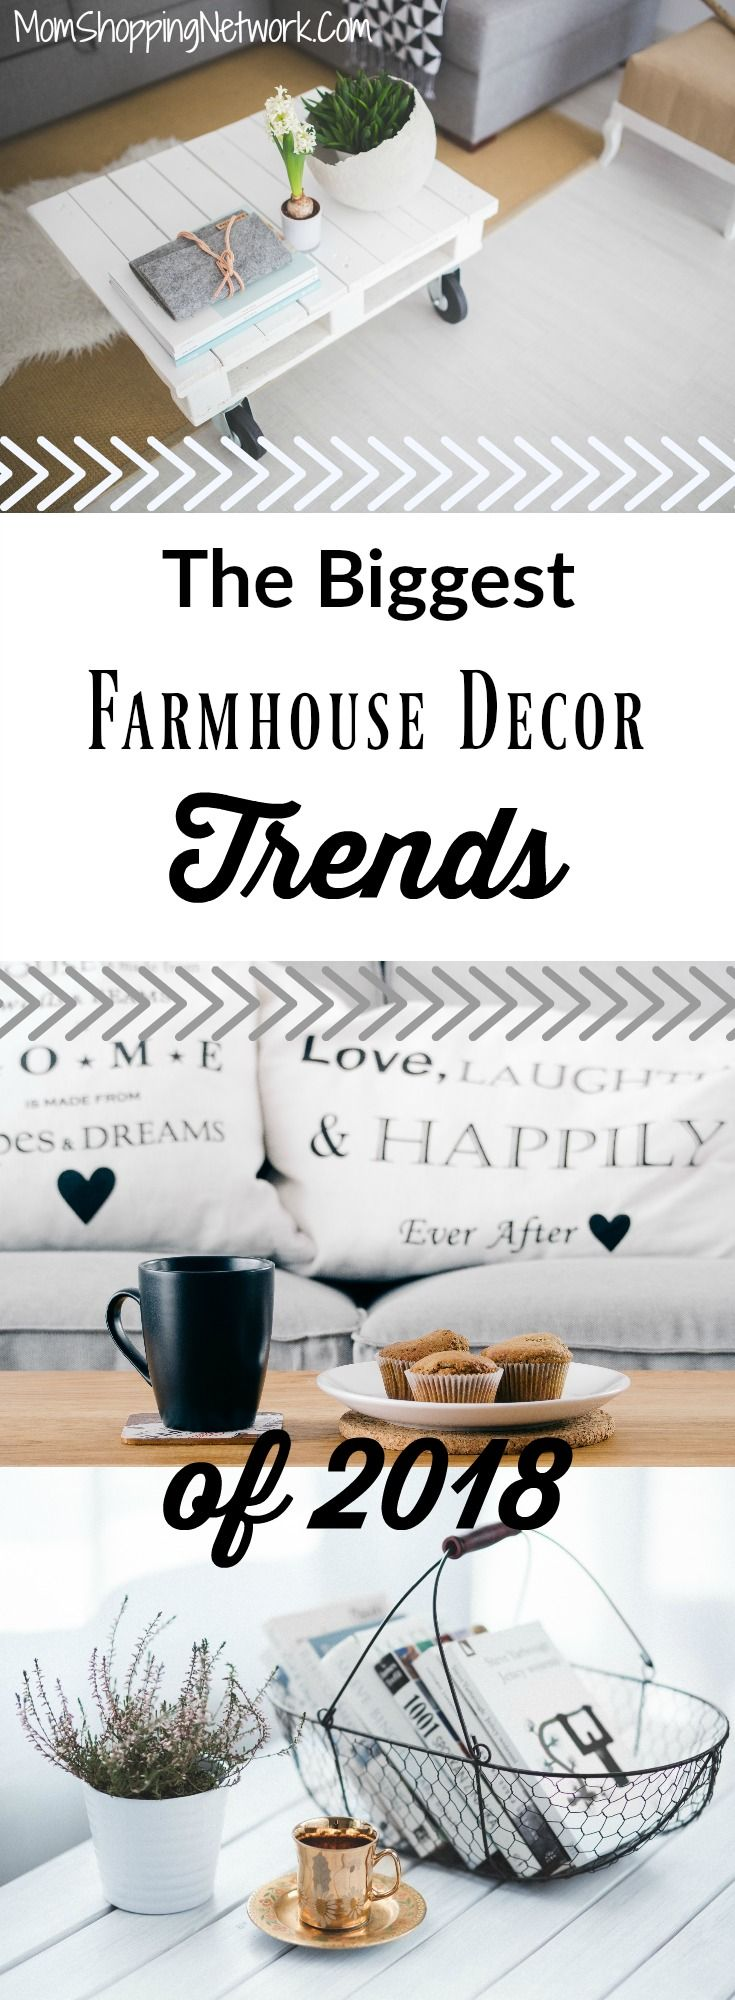 The-Biggest-Farmhouse-Decor-Trends-of-2018.jpg 735×2,000 pixels